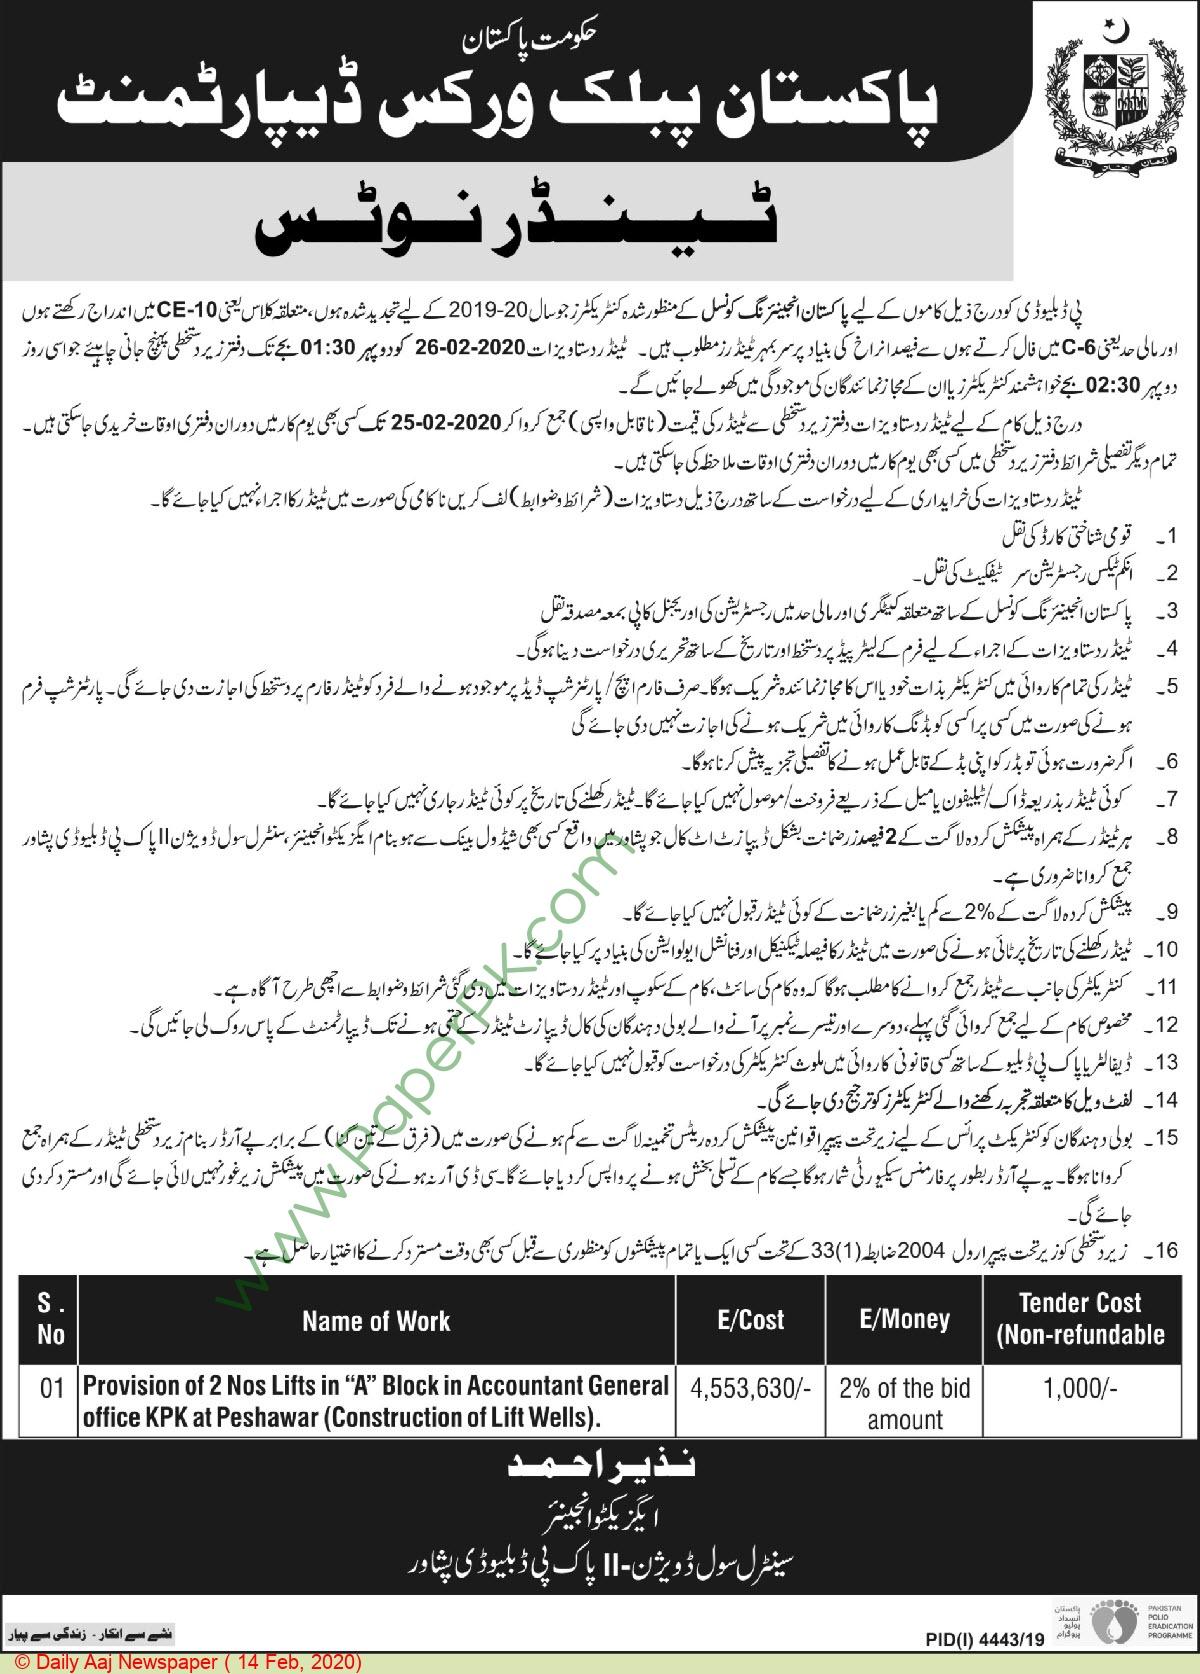 Pakistan Public Works Department Peshawar Tender Notice